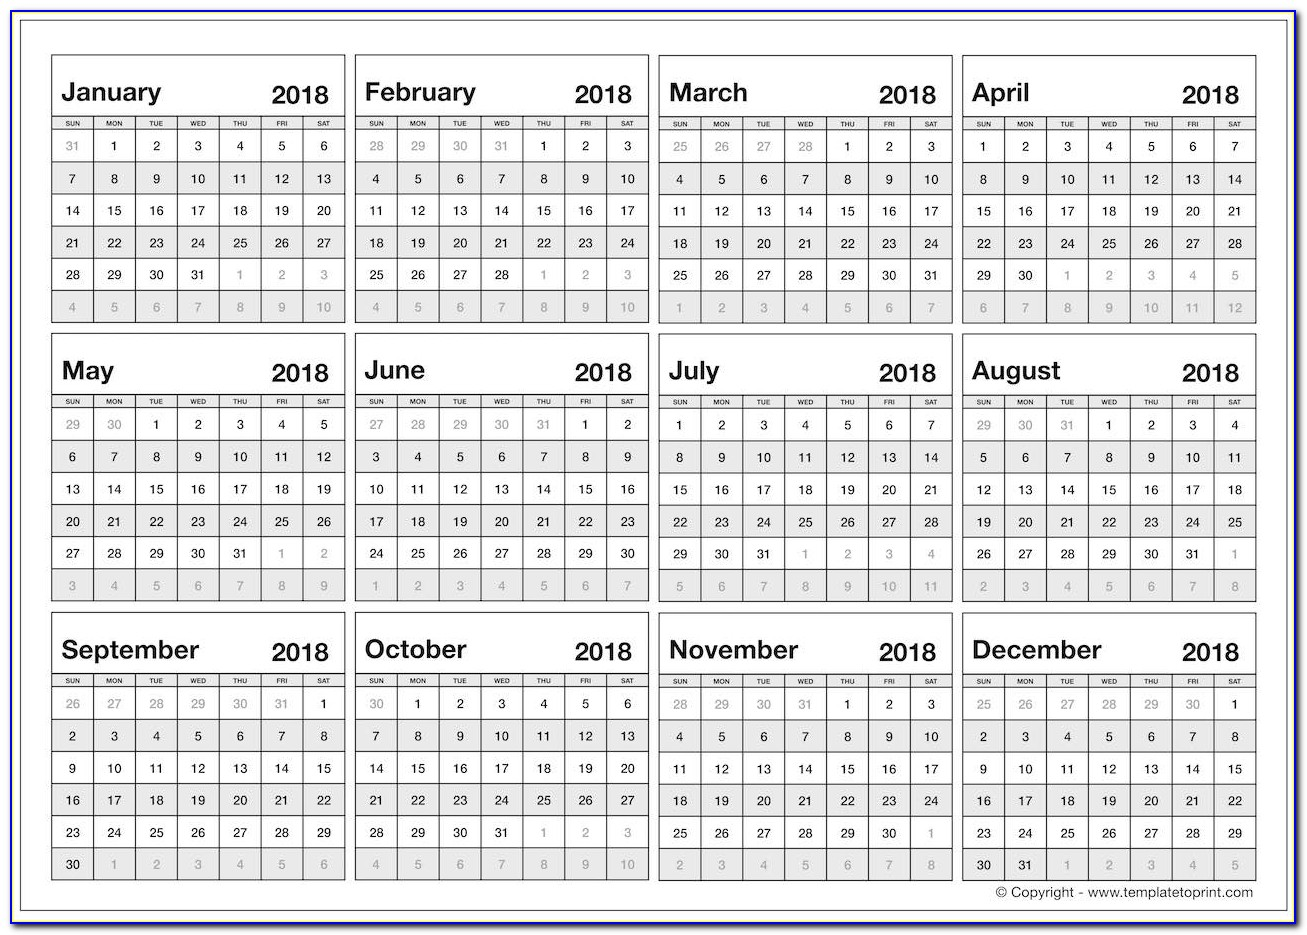 Editable 2018 Calendar Uk Printable With Holidays Year At A Glance